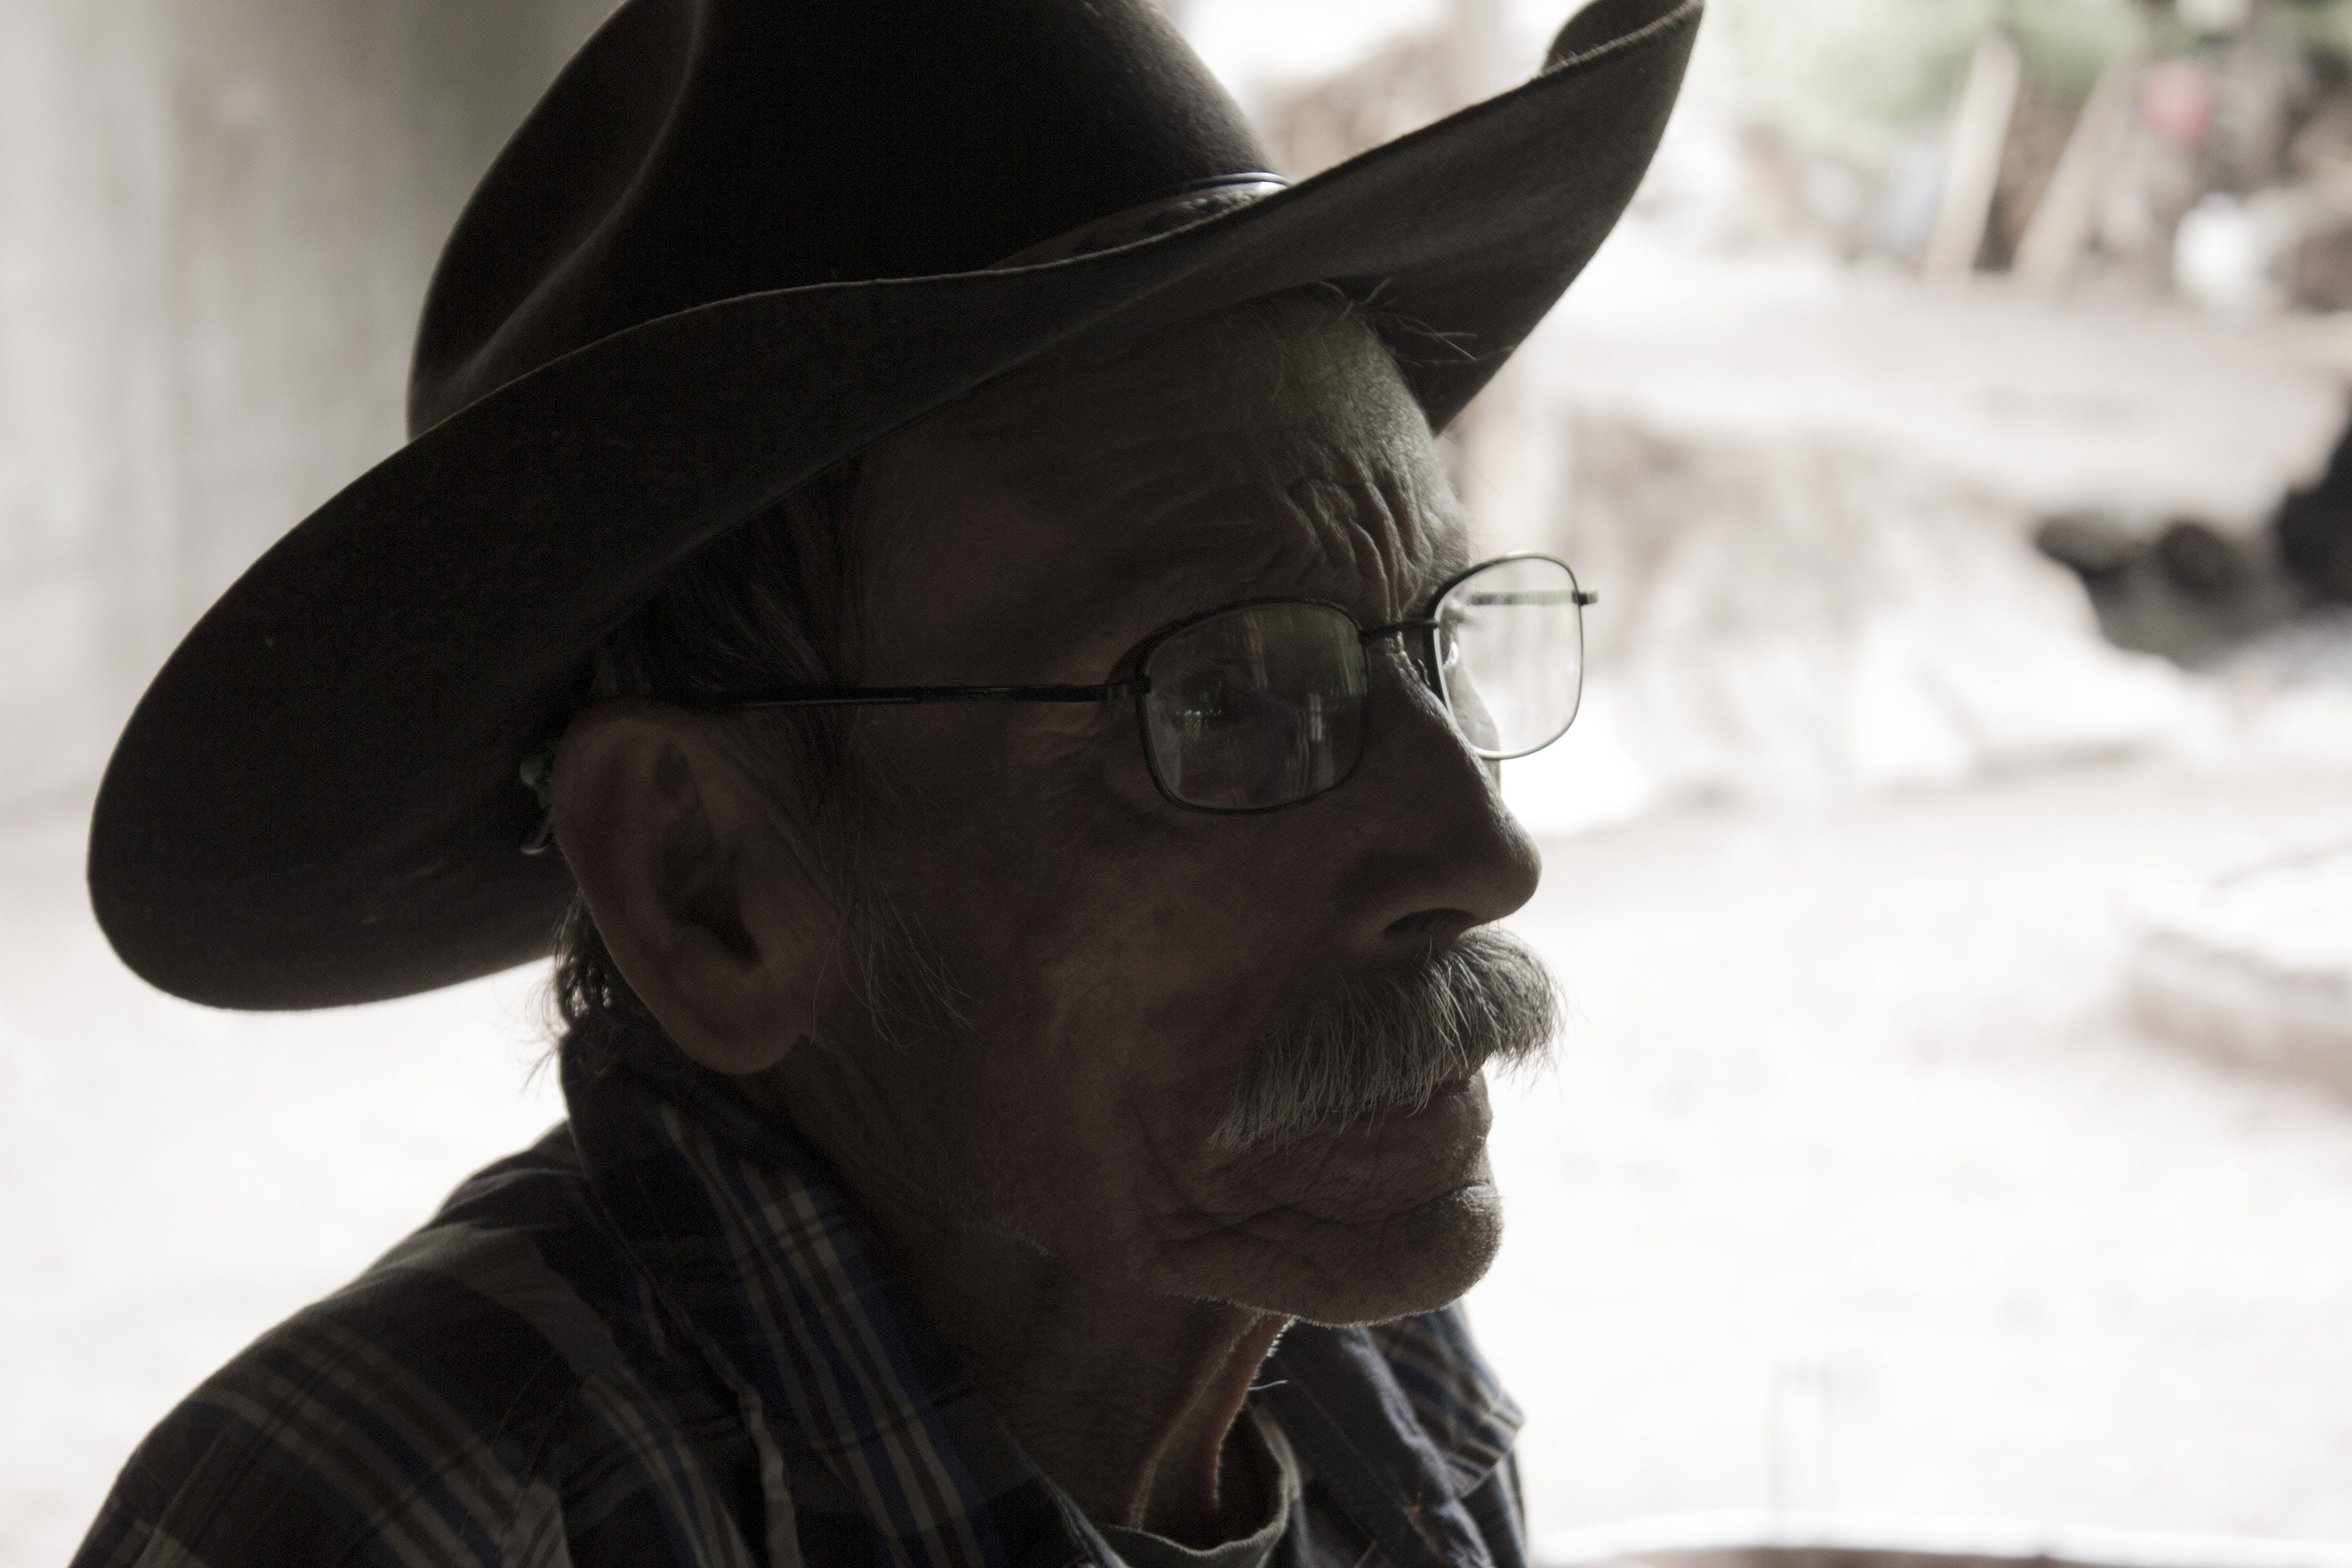 Man Wearing Eyeglasses and Cowboy Hat